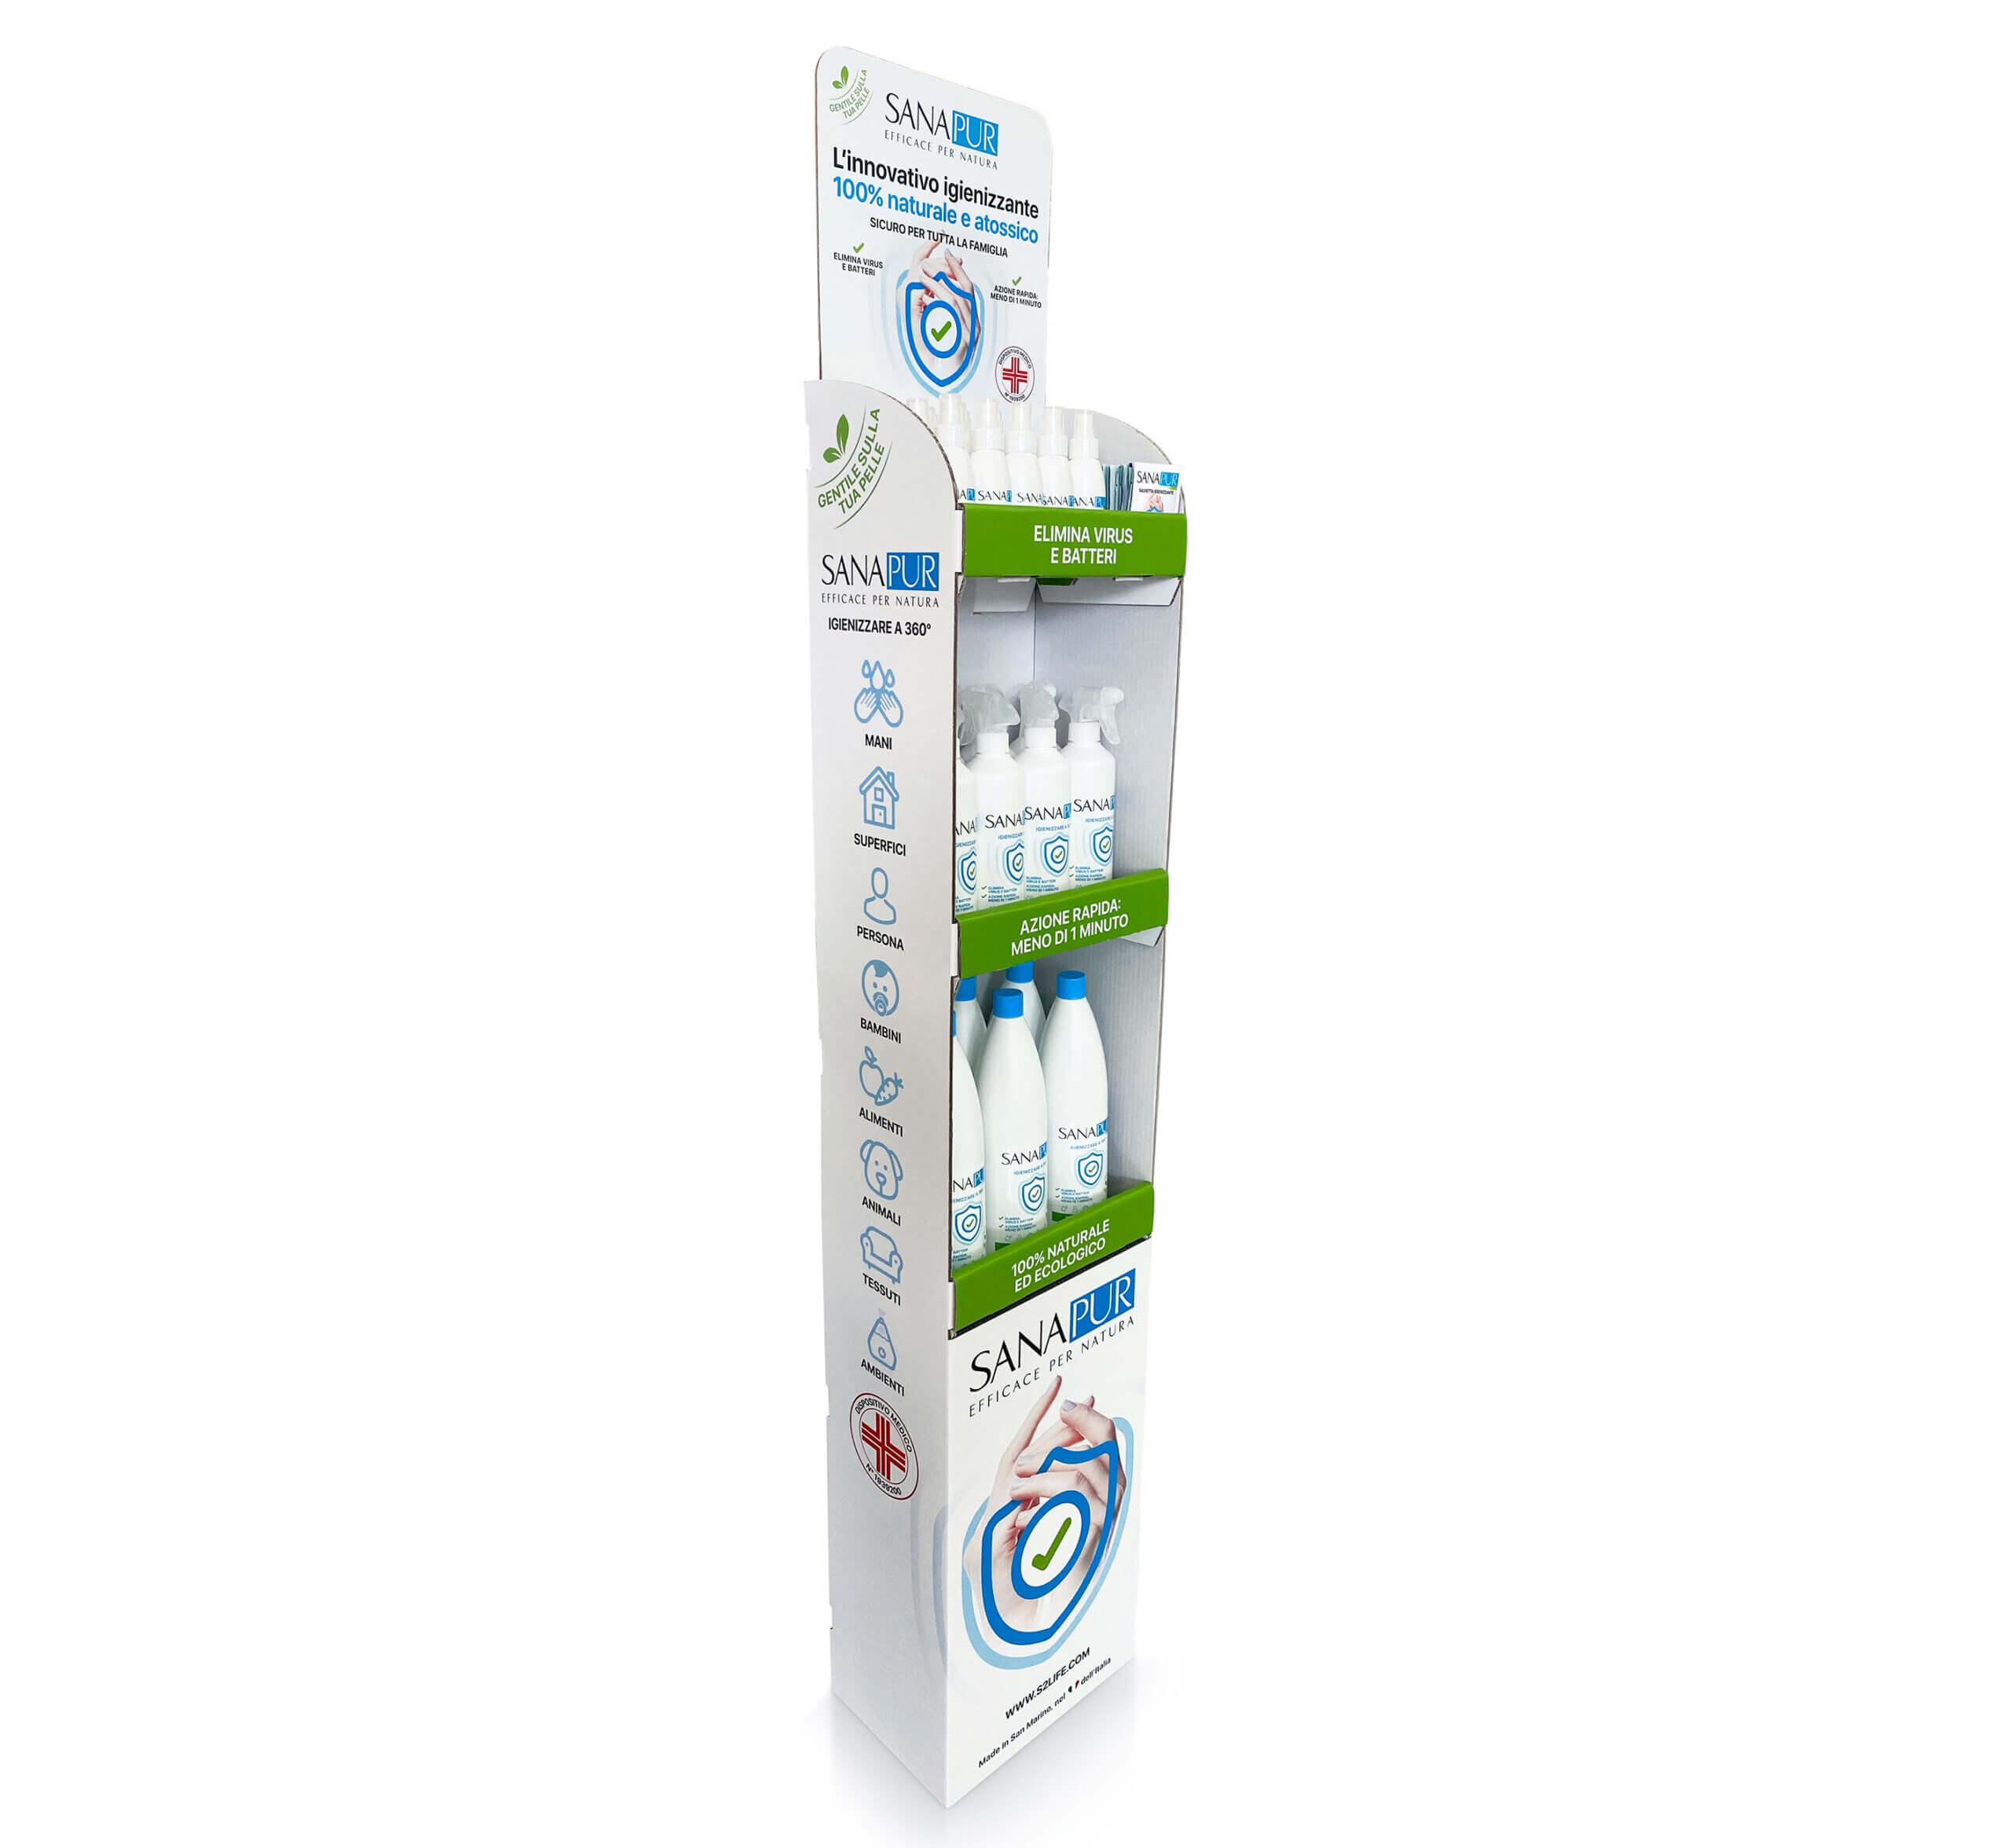 floor-display-disinfectant-sanitizing-sanitizing-sanapur-S2Life